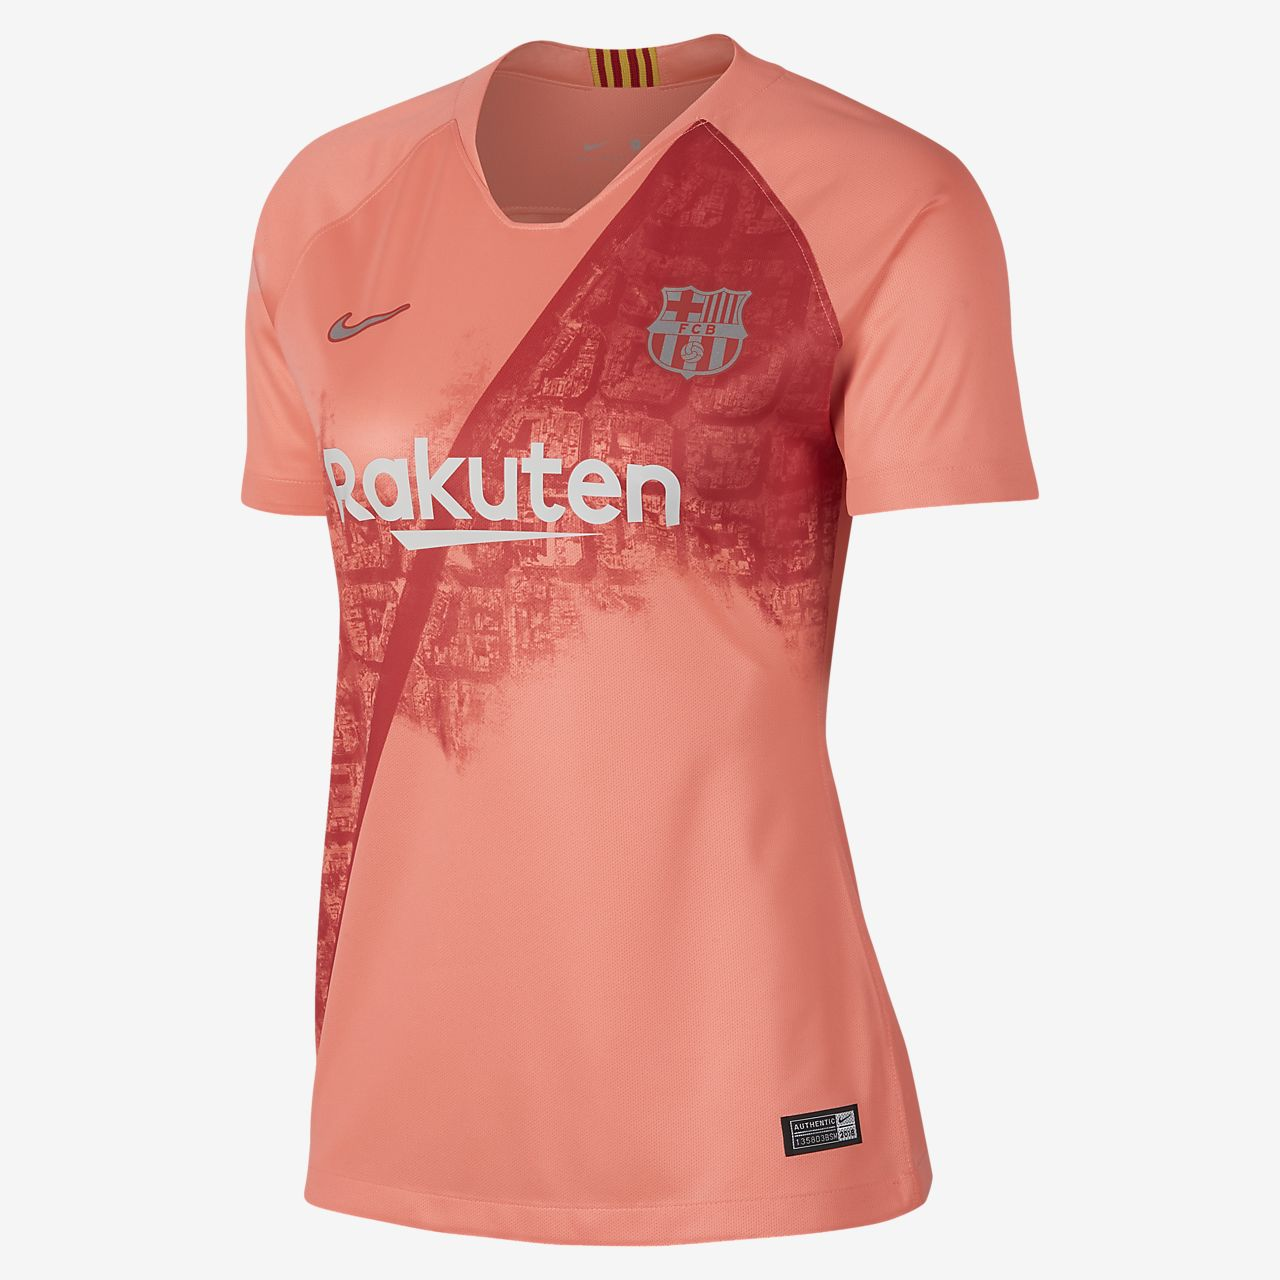 Barcelona Camiseta Del Stadium Para Mujer Fc De Fútbol Alternativa PYPw8qr